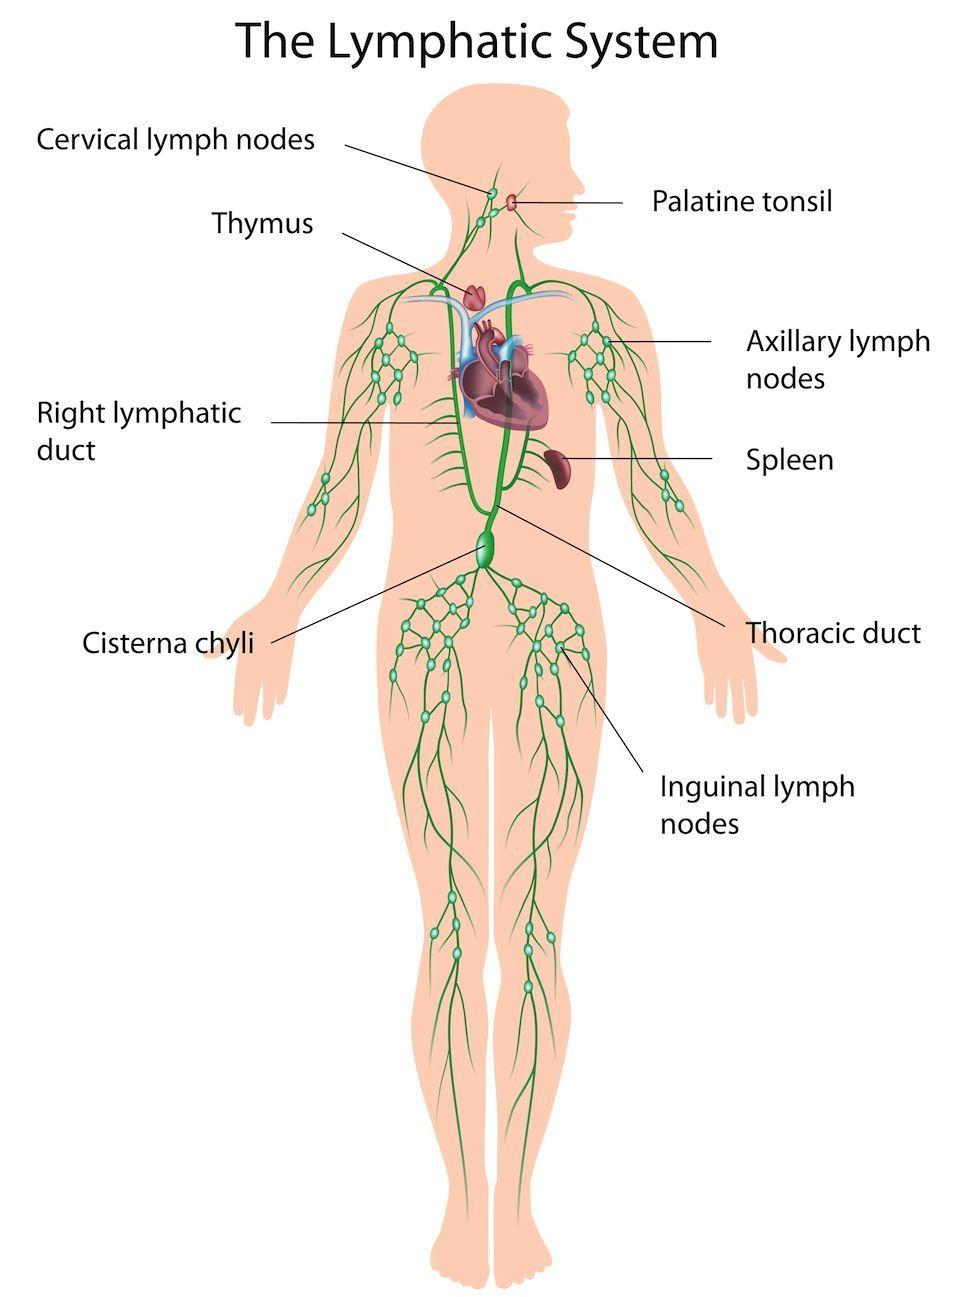 female lymphatic system diagram female lymphatic system diagram female lymphatic system female lymphatic system cc3 [ 960 x 1297 Pixel ]